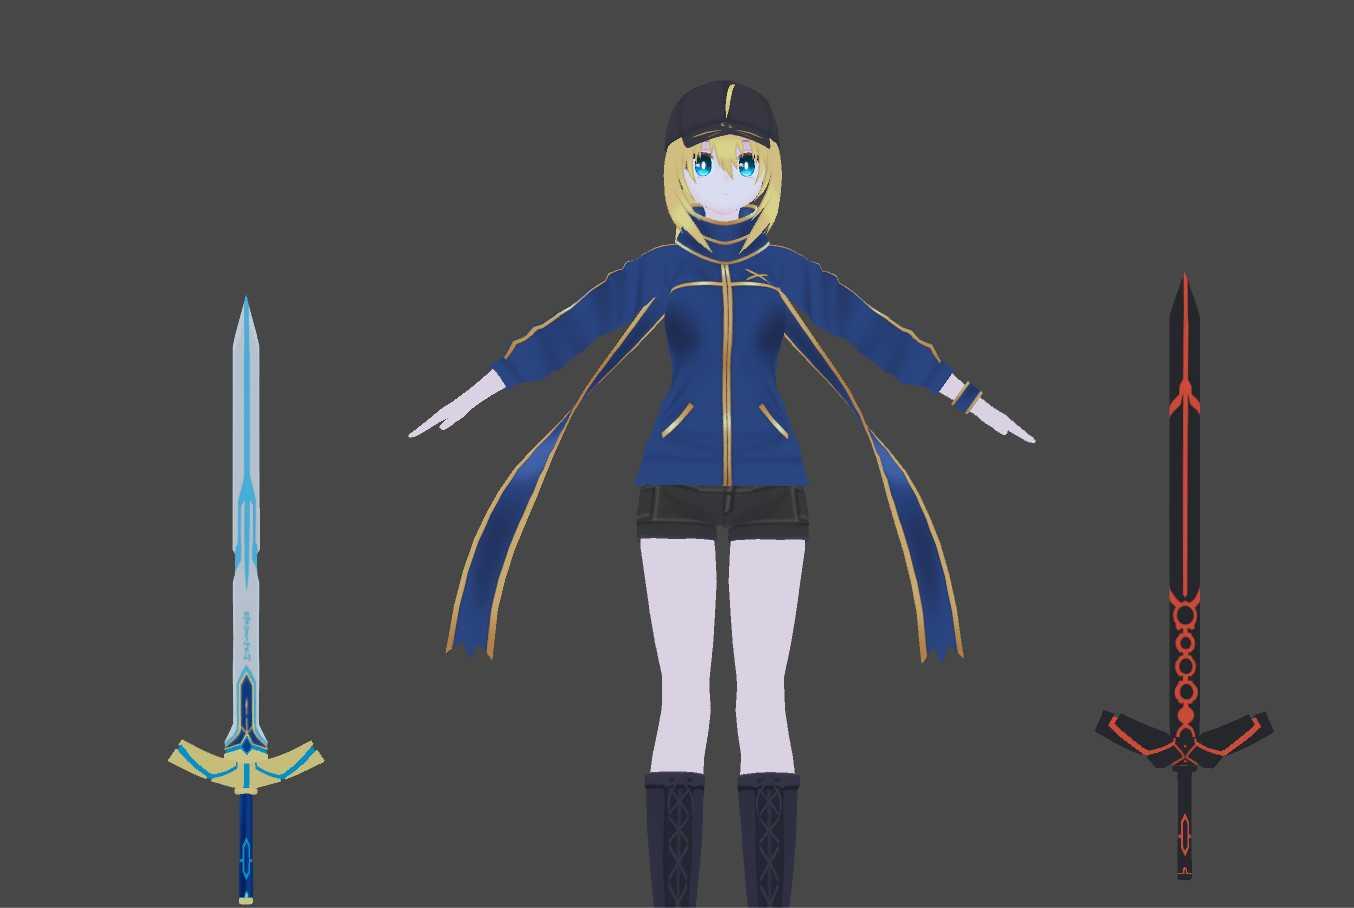 VRCMods - Casual Ooka Miko [Avatar World ready] - VRChat Avatars